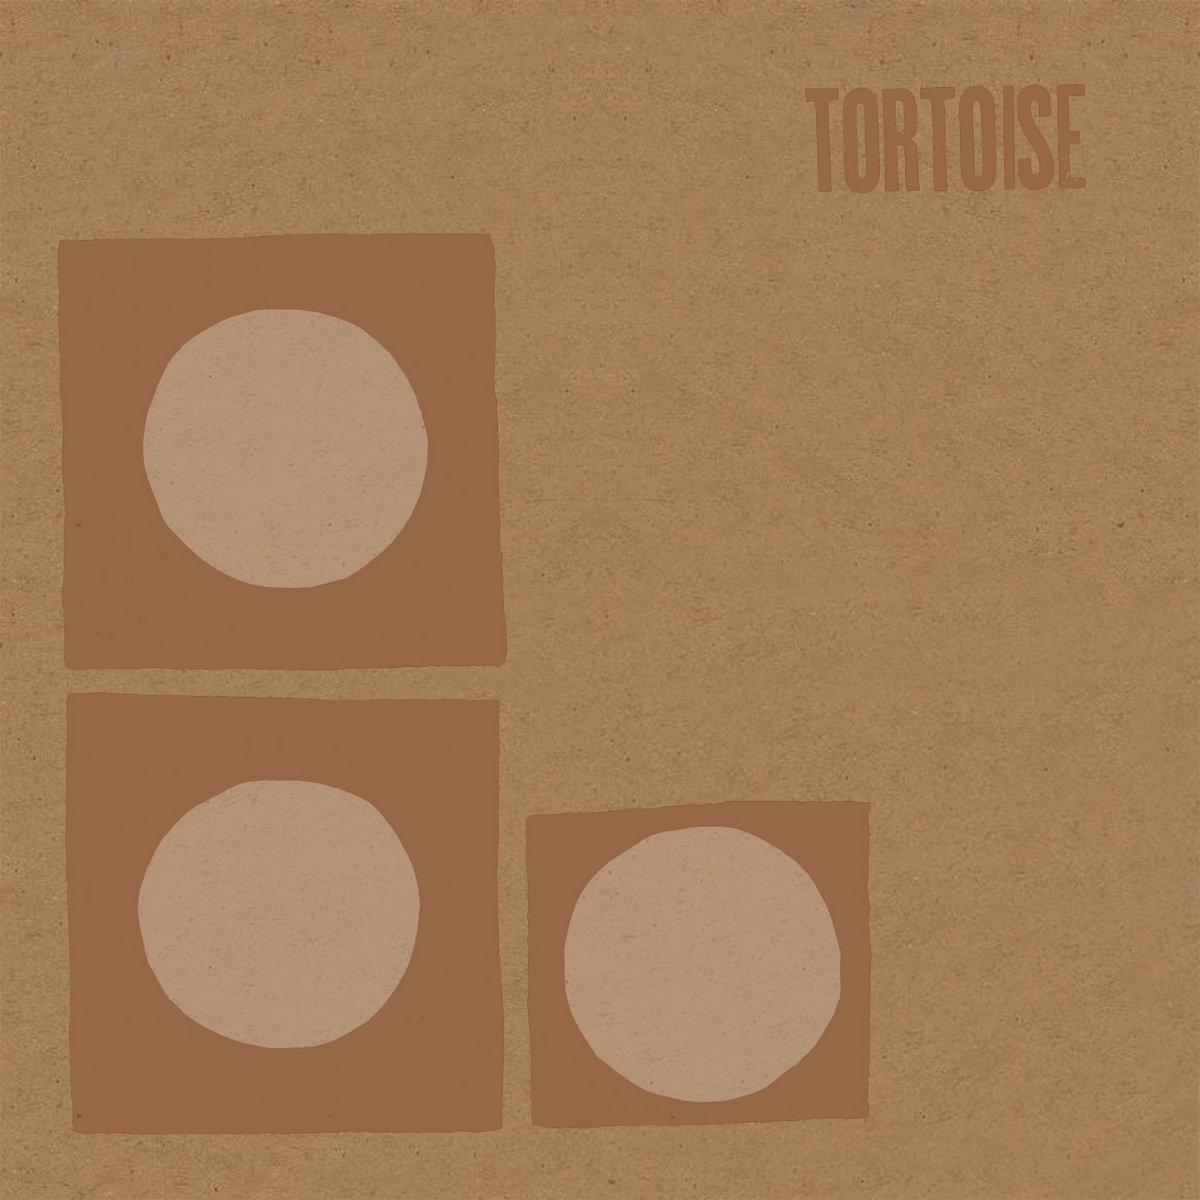 Tortoise - Tortoise [LP]